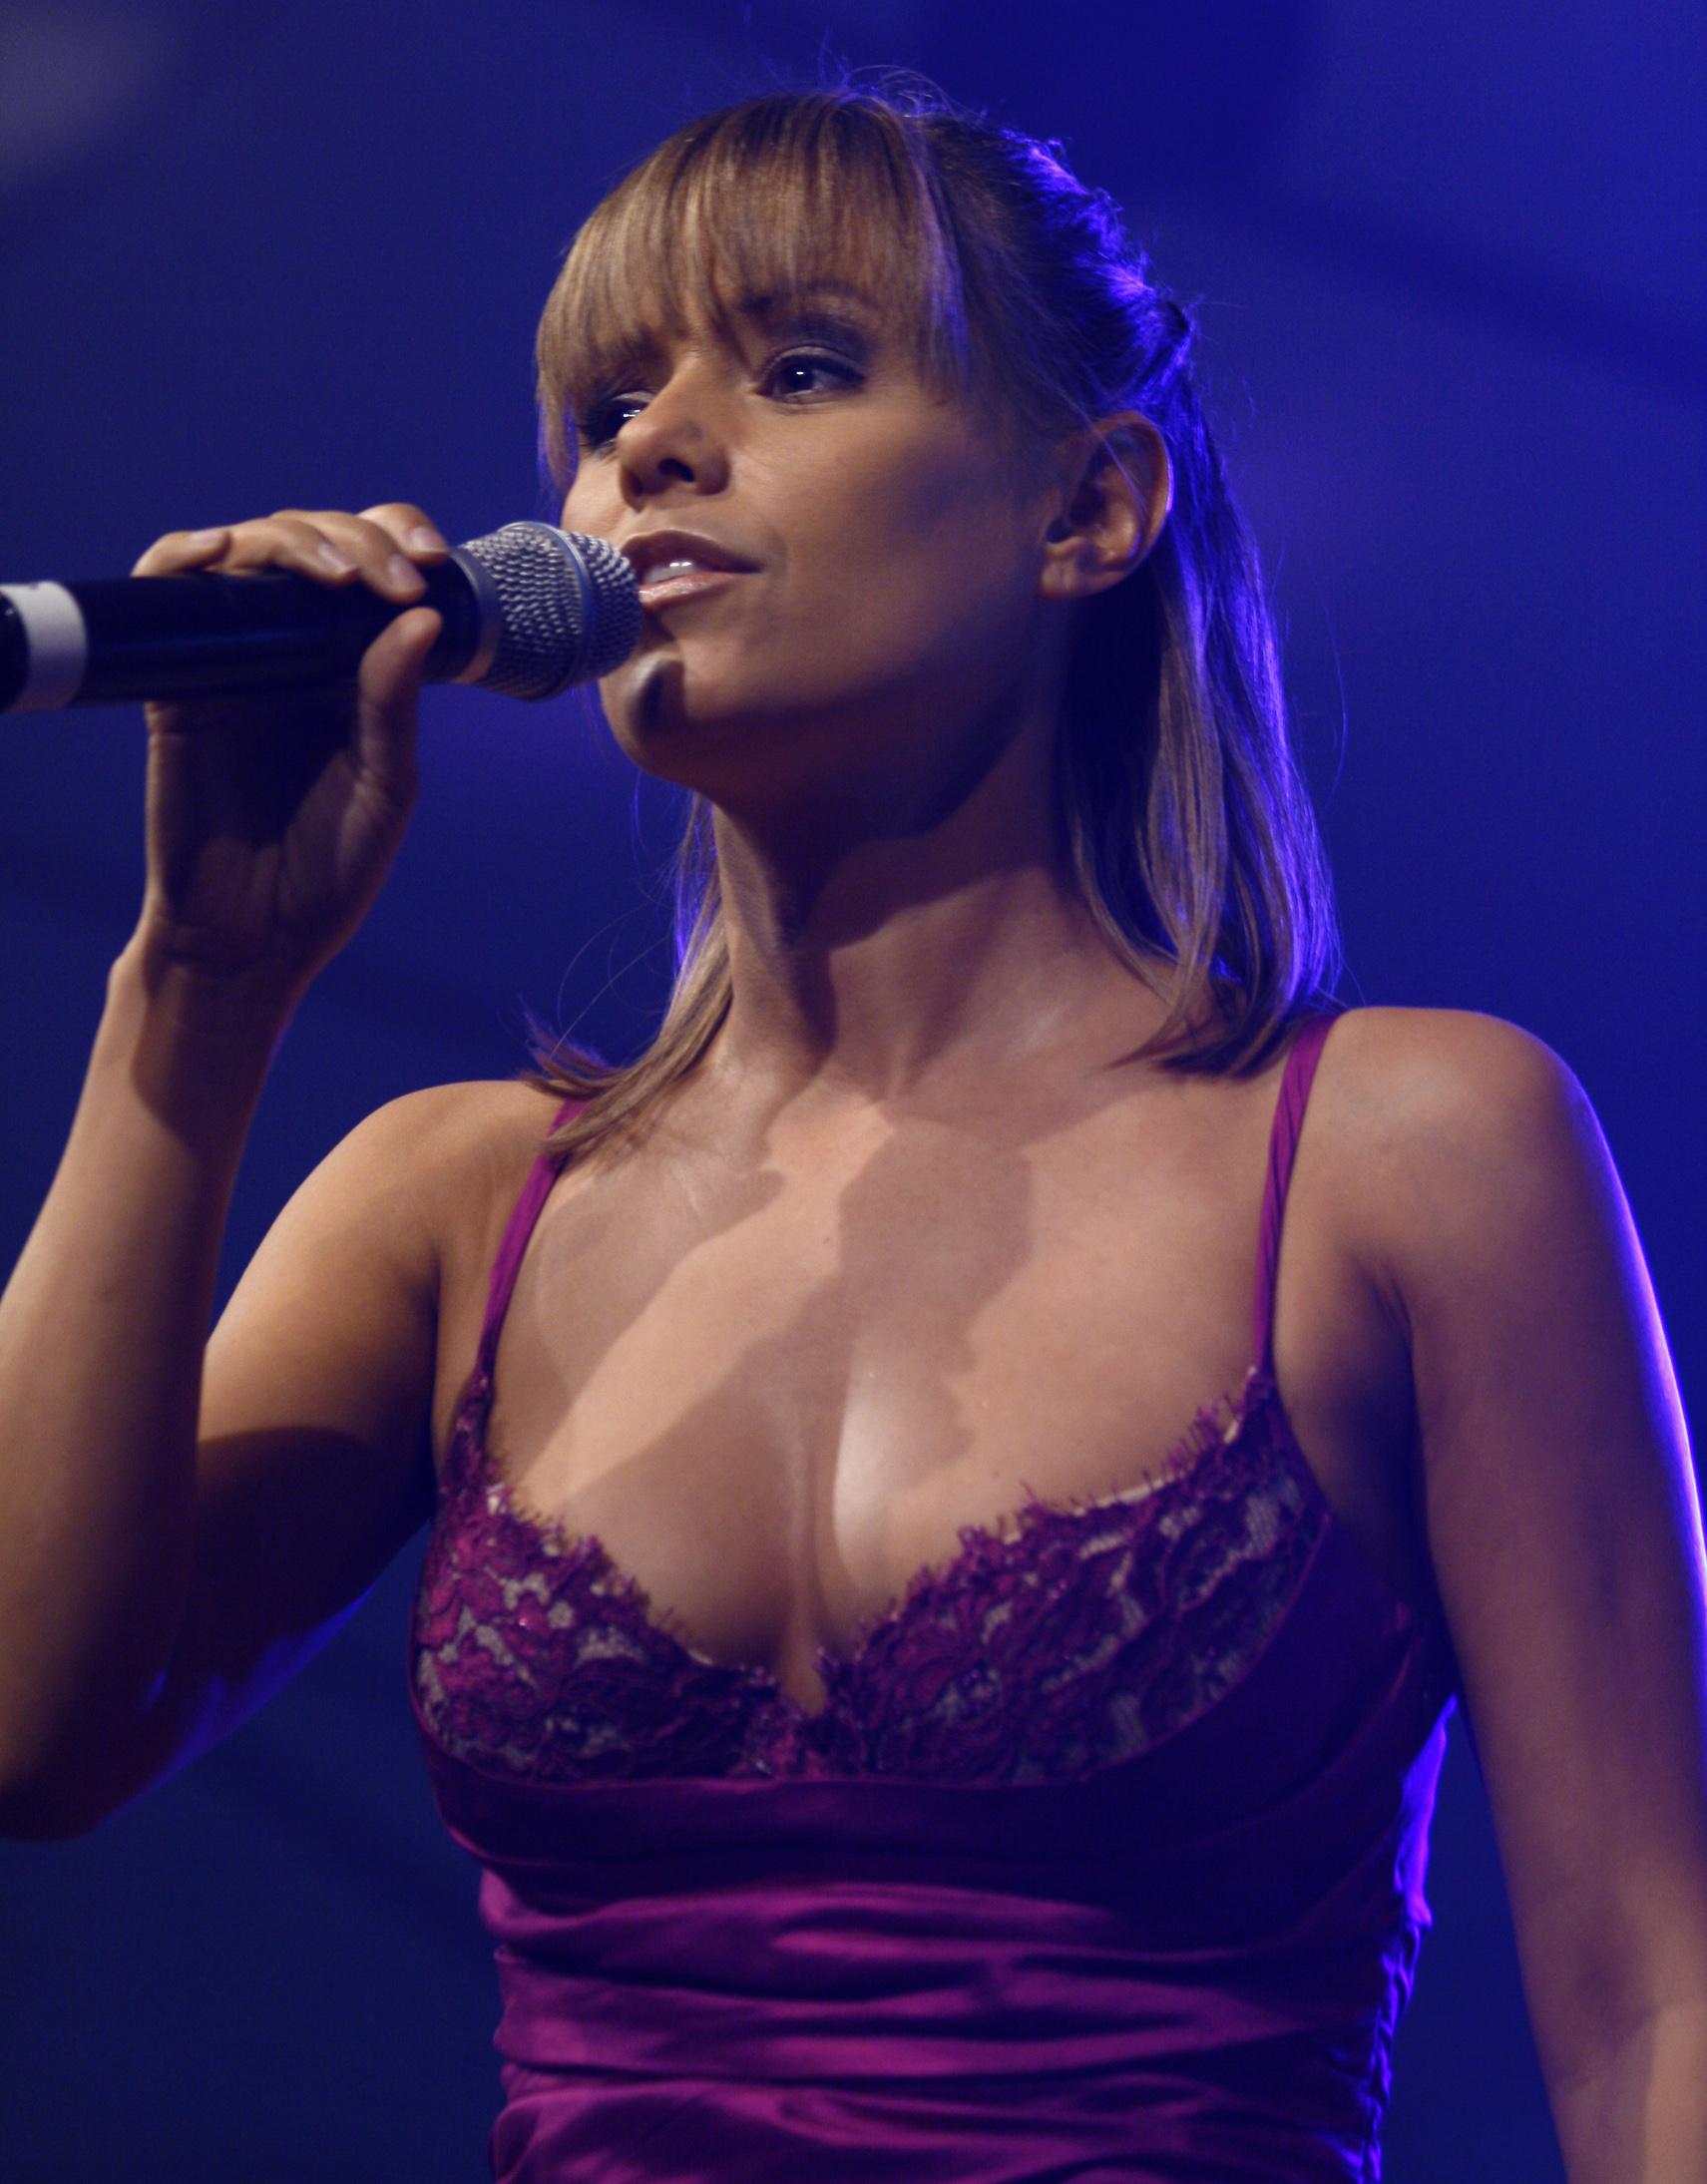 Francine jordi fakes magnificent